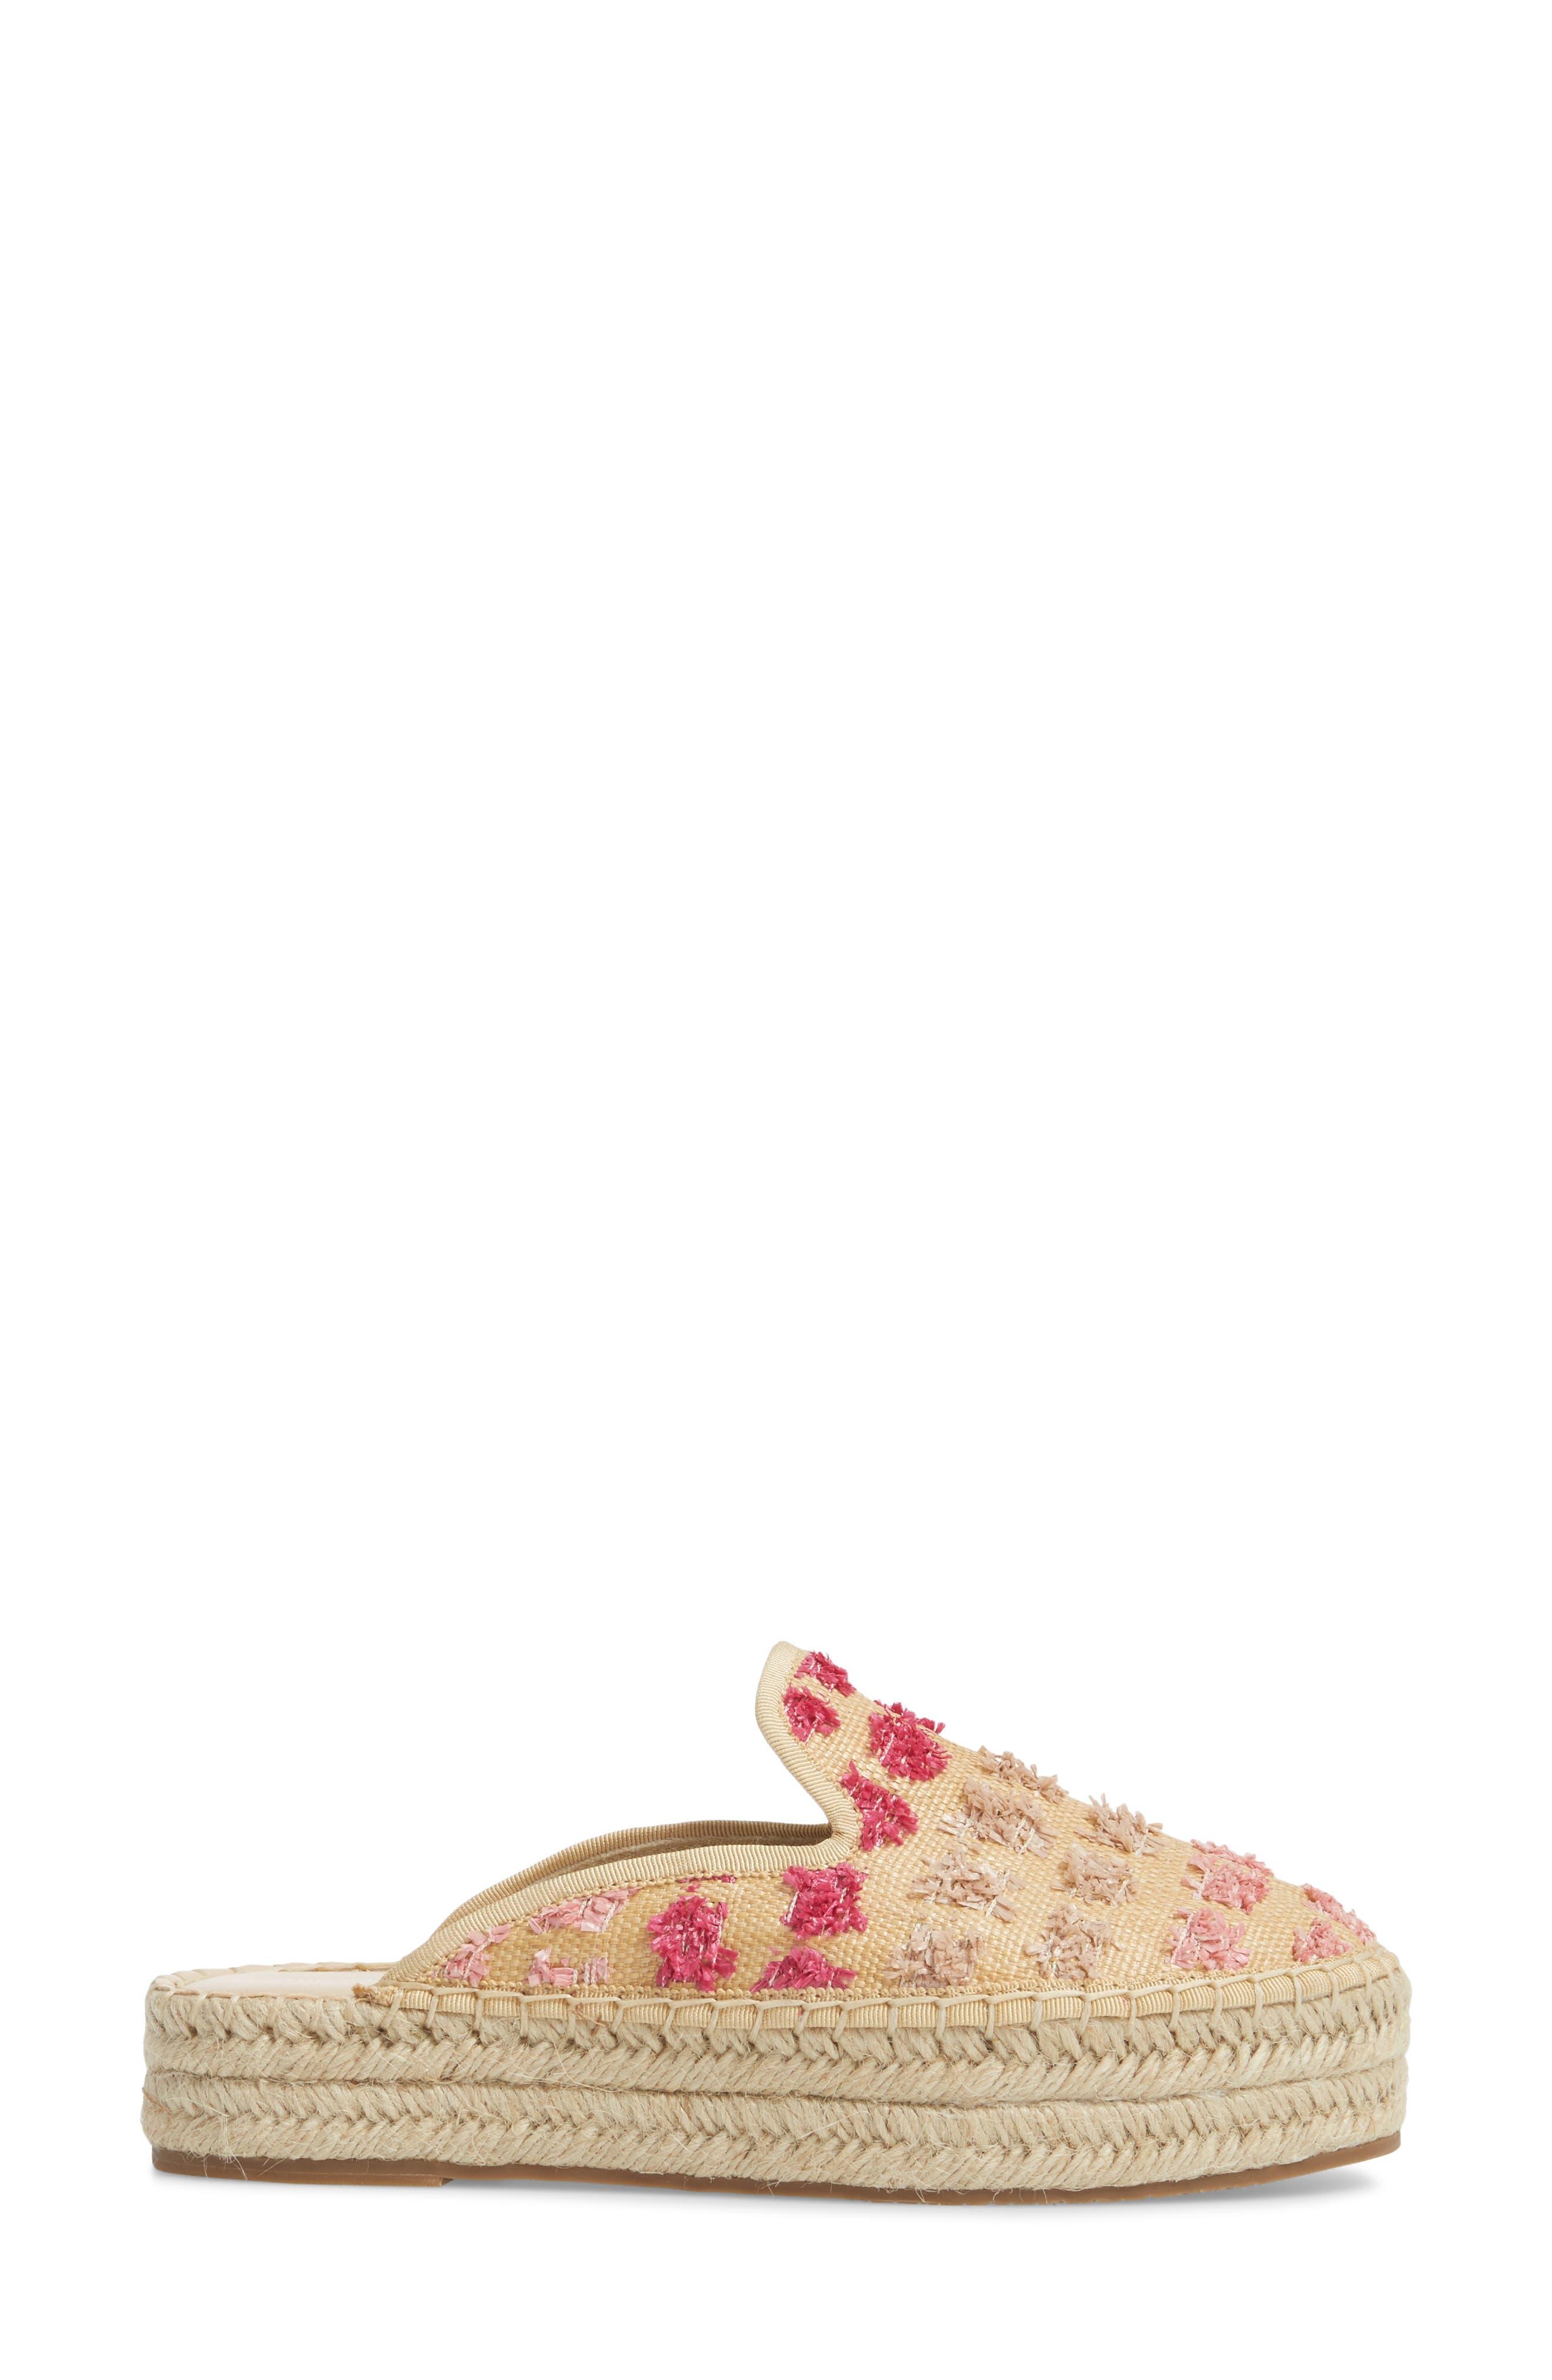 Marlowe Tufted Espadrille Loafer Mule,                             Alternate thumbnail 3, color,                             Pink Multi Faux Raffia